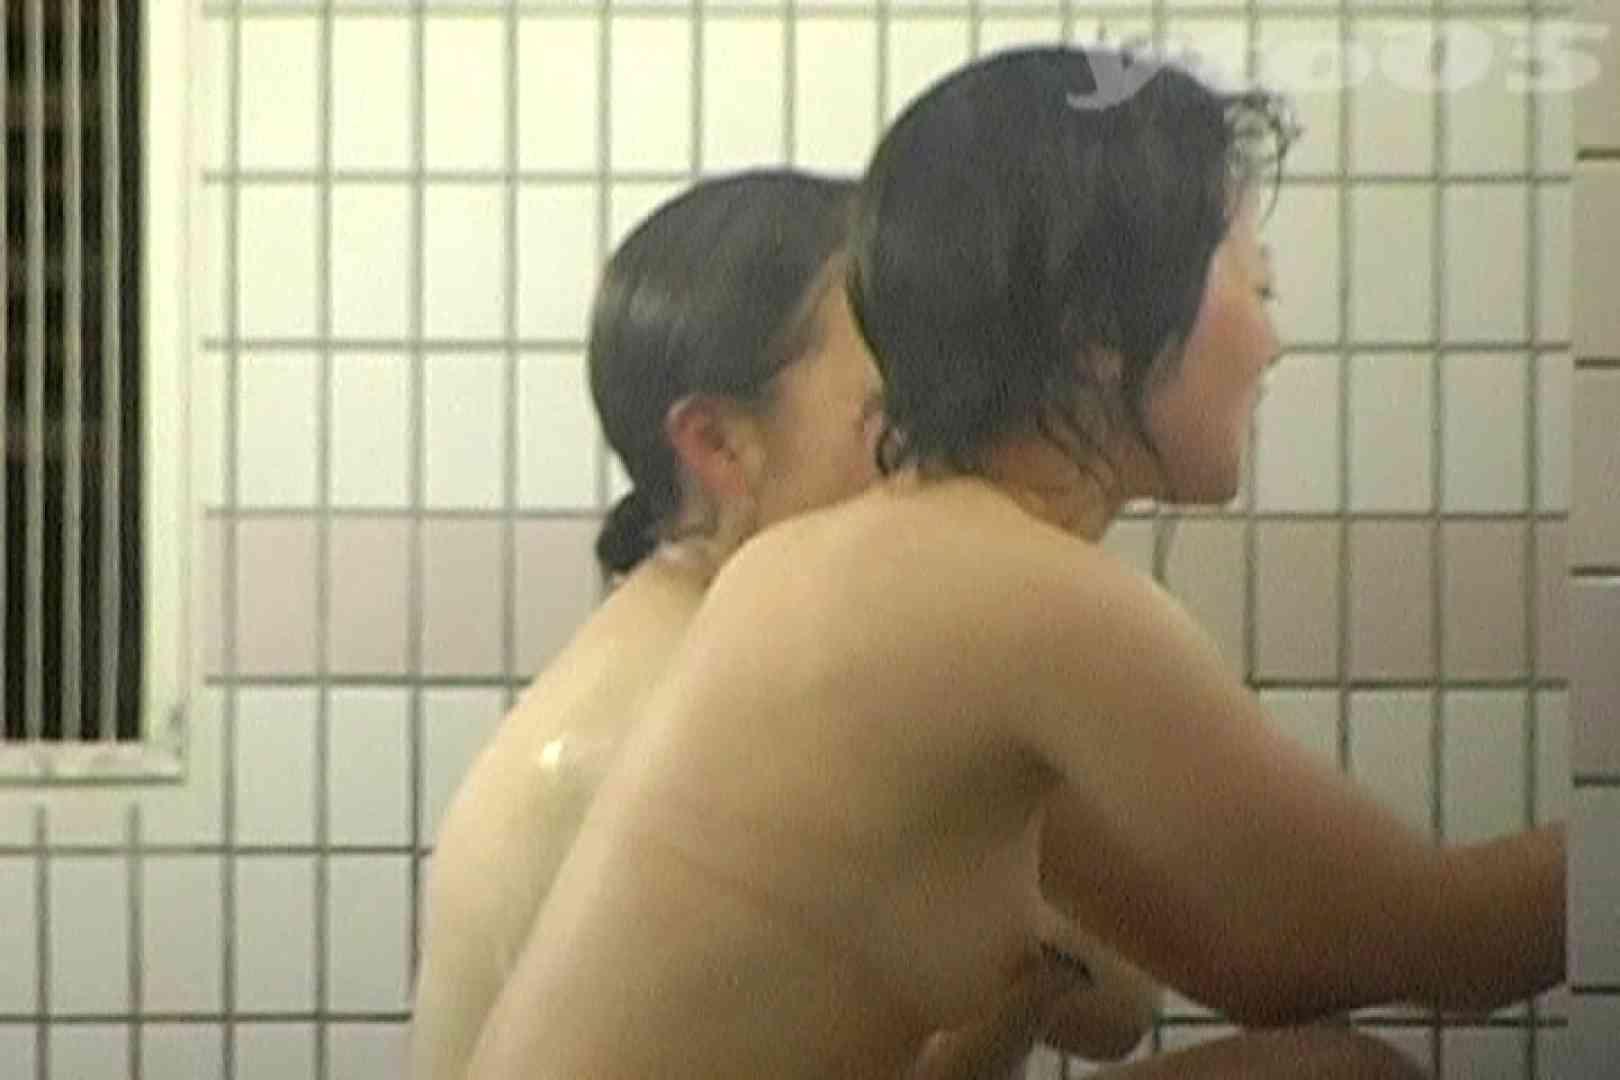 ▲復活限定▲合宿ホテル女風呂盗撮 Vol.28 OL | 合宿  38連発 24